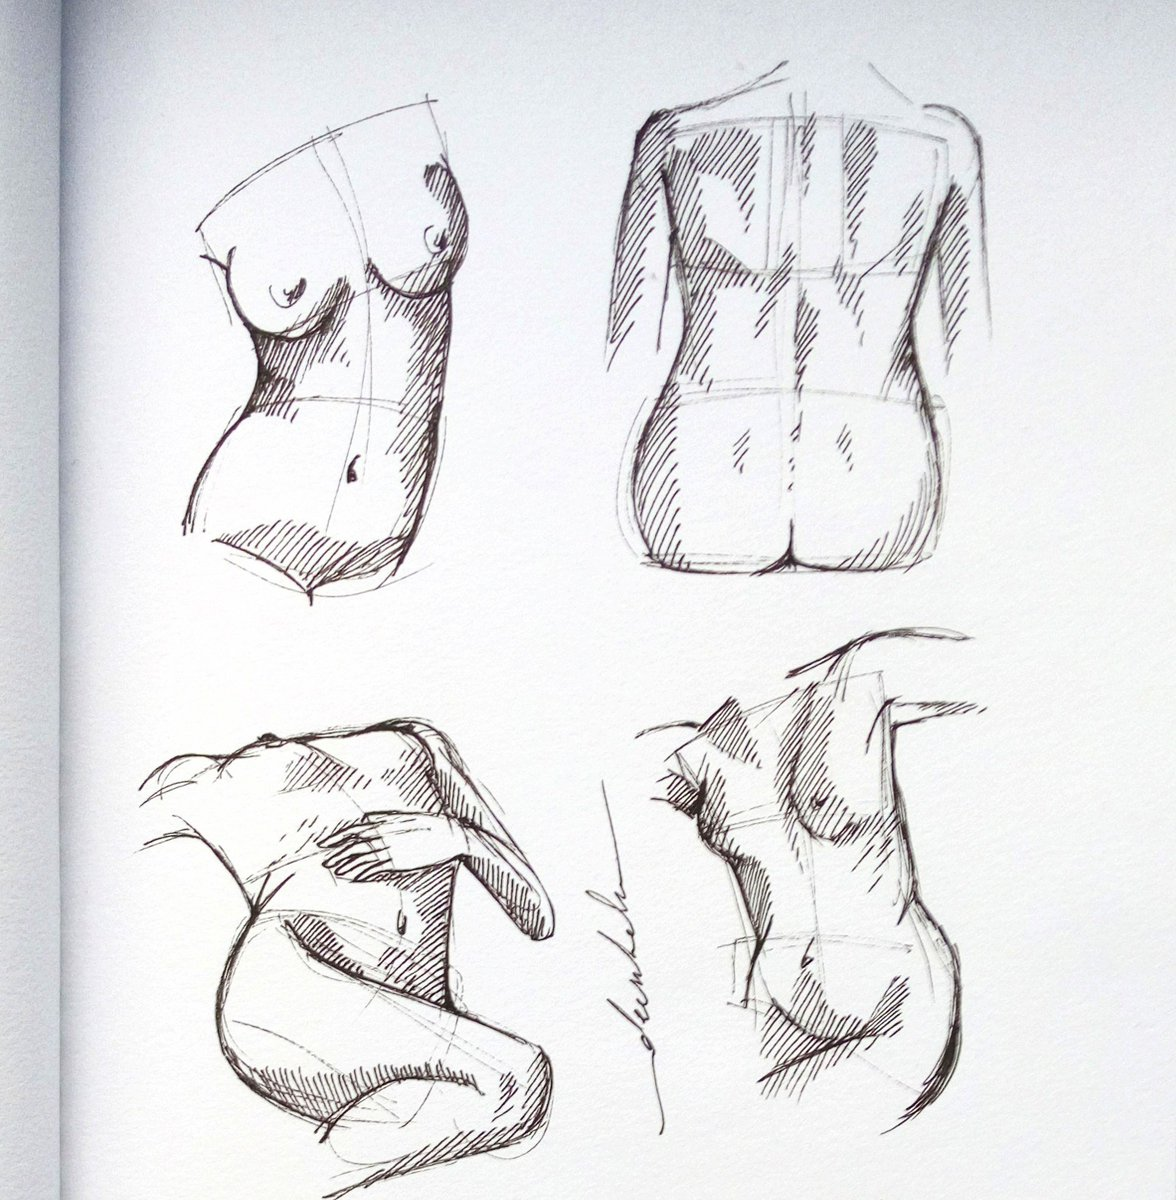 Quick sketch #dailyart #dailyillustration #quicksketch #bodyproportions #figuredrawing #figurativedrawing https://t.co/SeMx85wSER